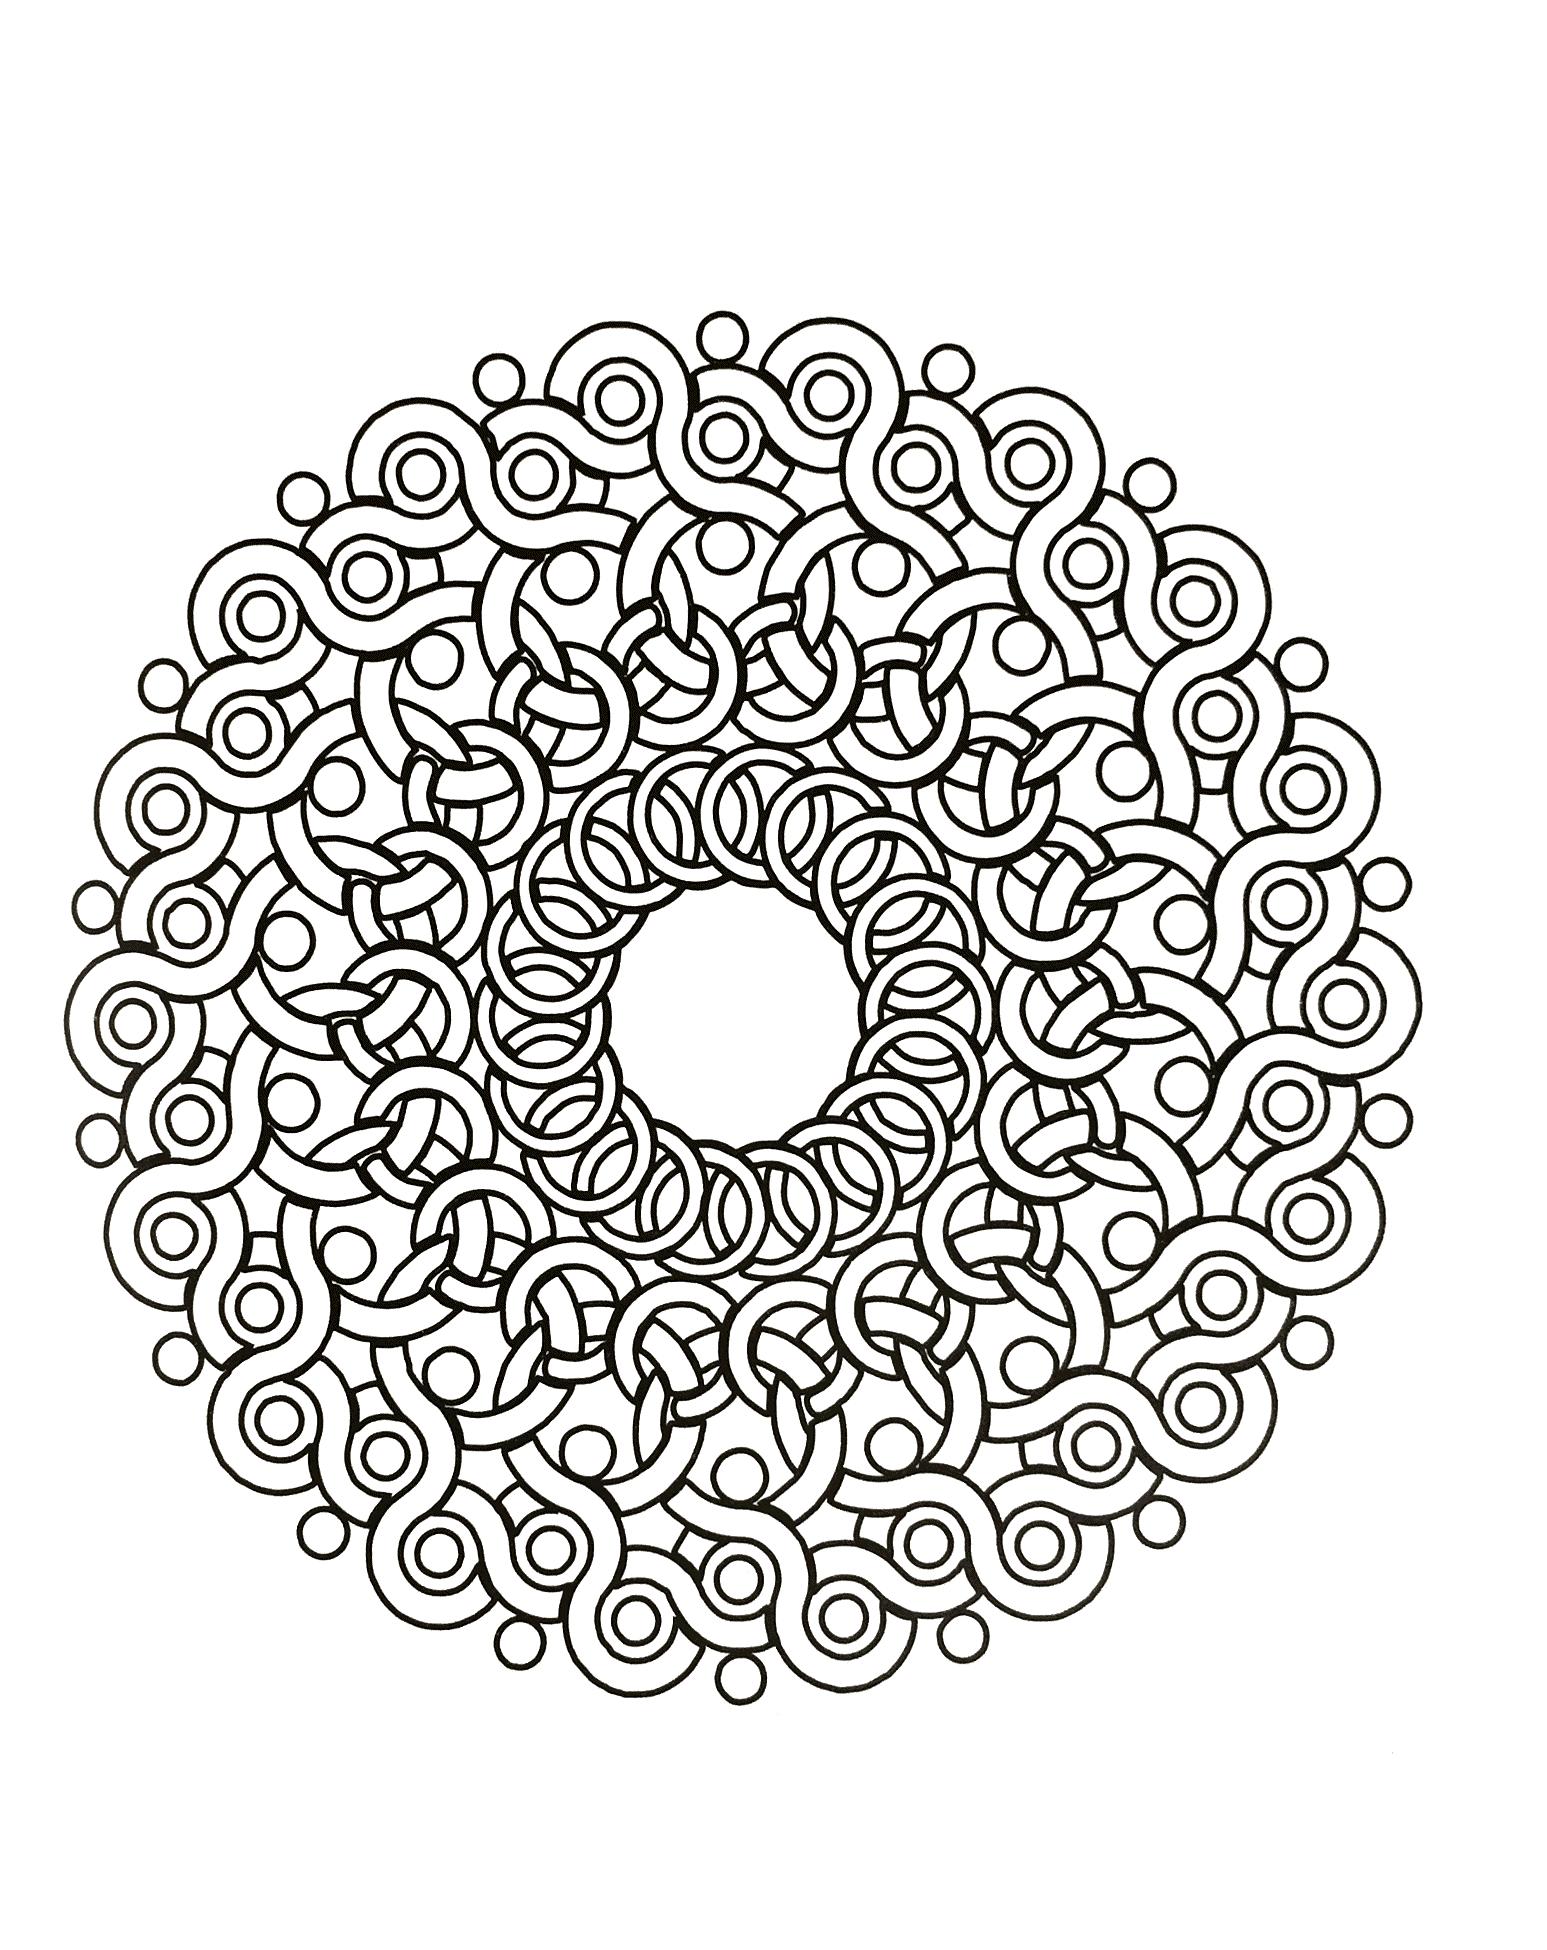 Free coloring page mandalas-to-download-for-free-30. mandalas-to ...